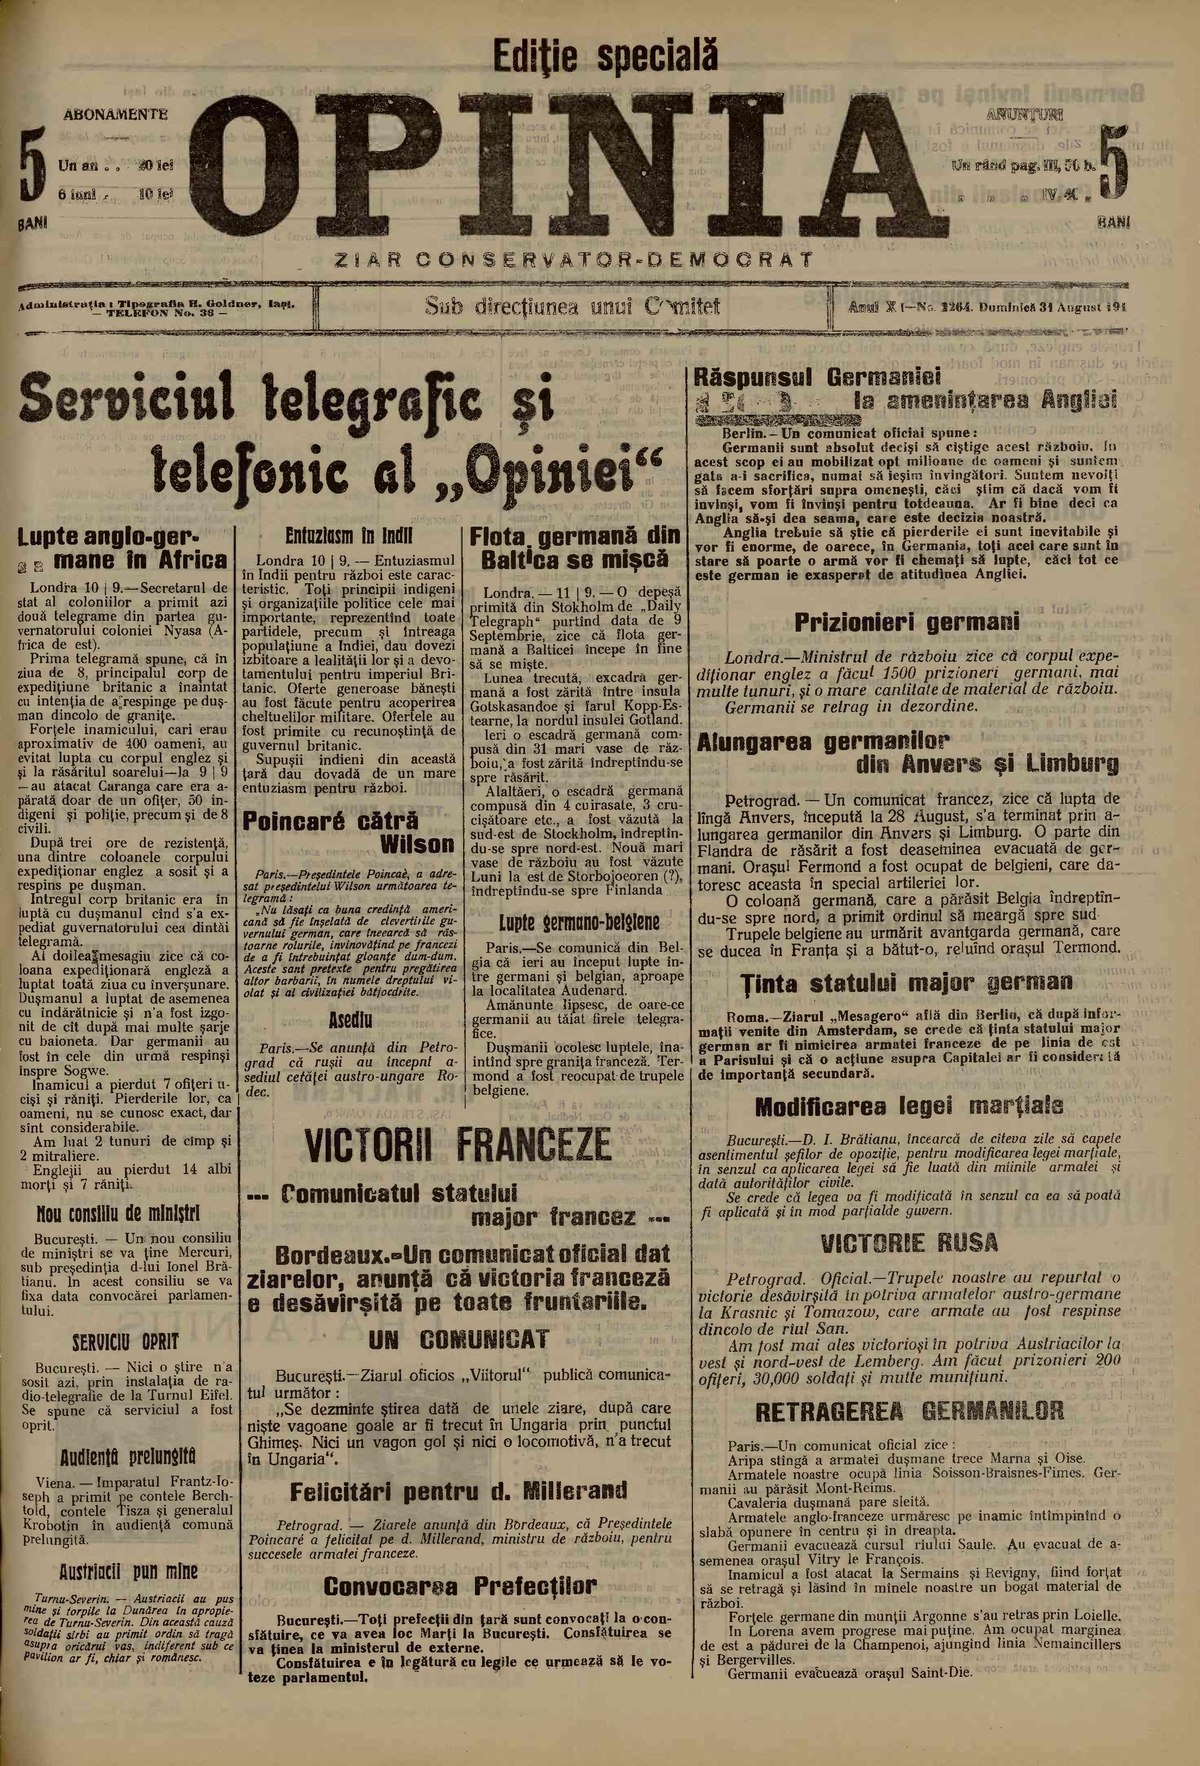 File:Opinia 1914-08-31, nr. 02264.pdf - Wikimedia Commons